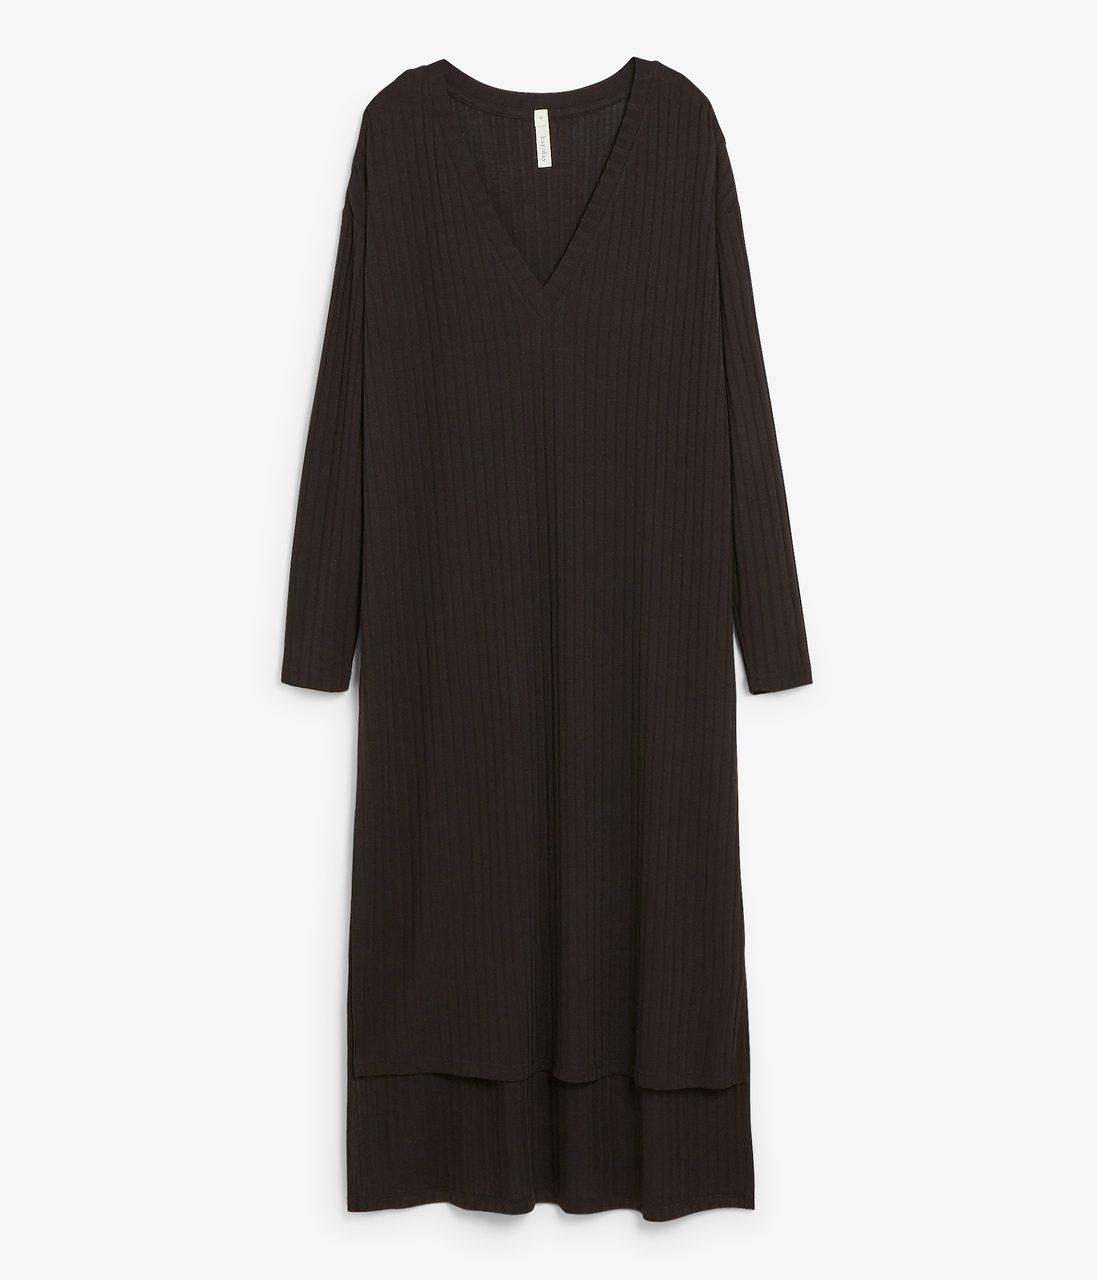 One-piece garment, Dress, Sleeve, Grey, Collar